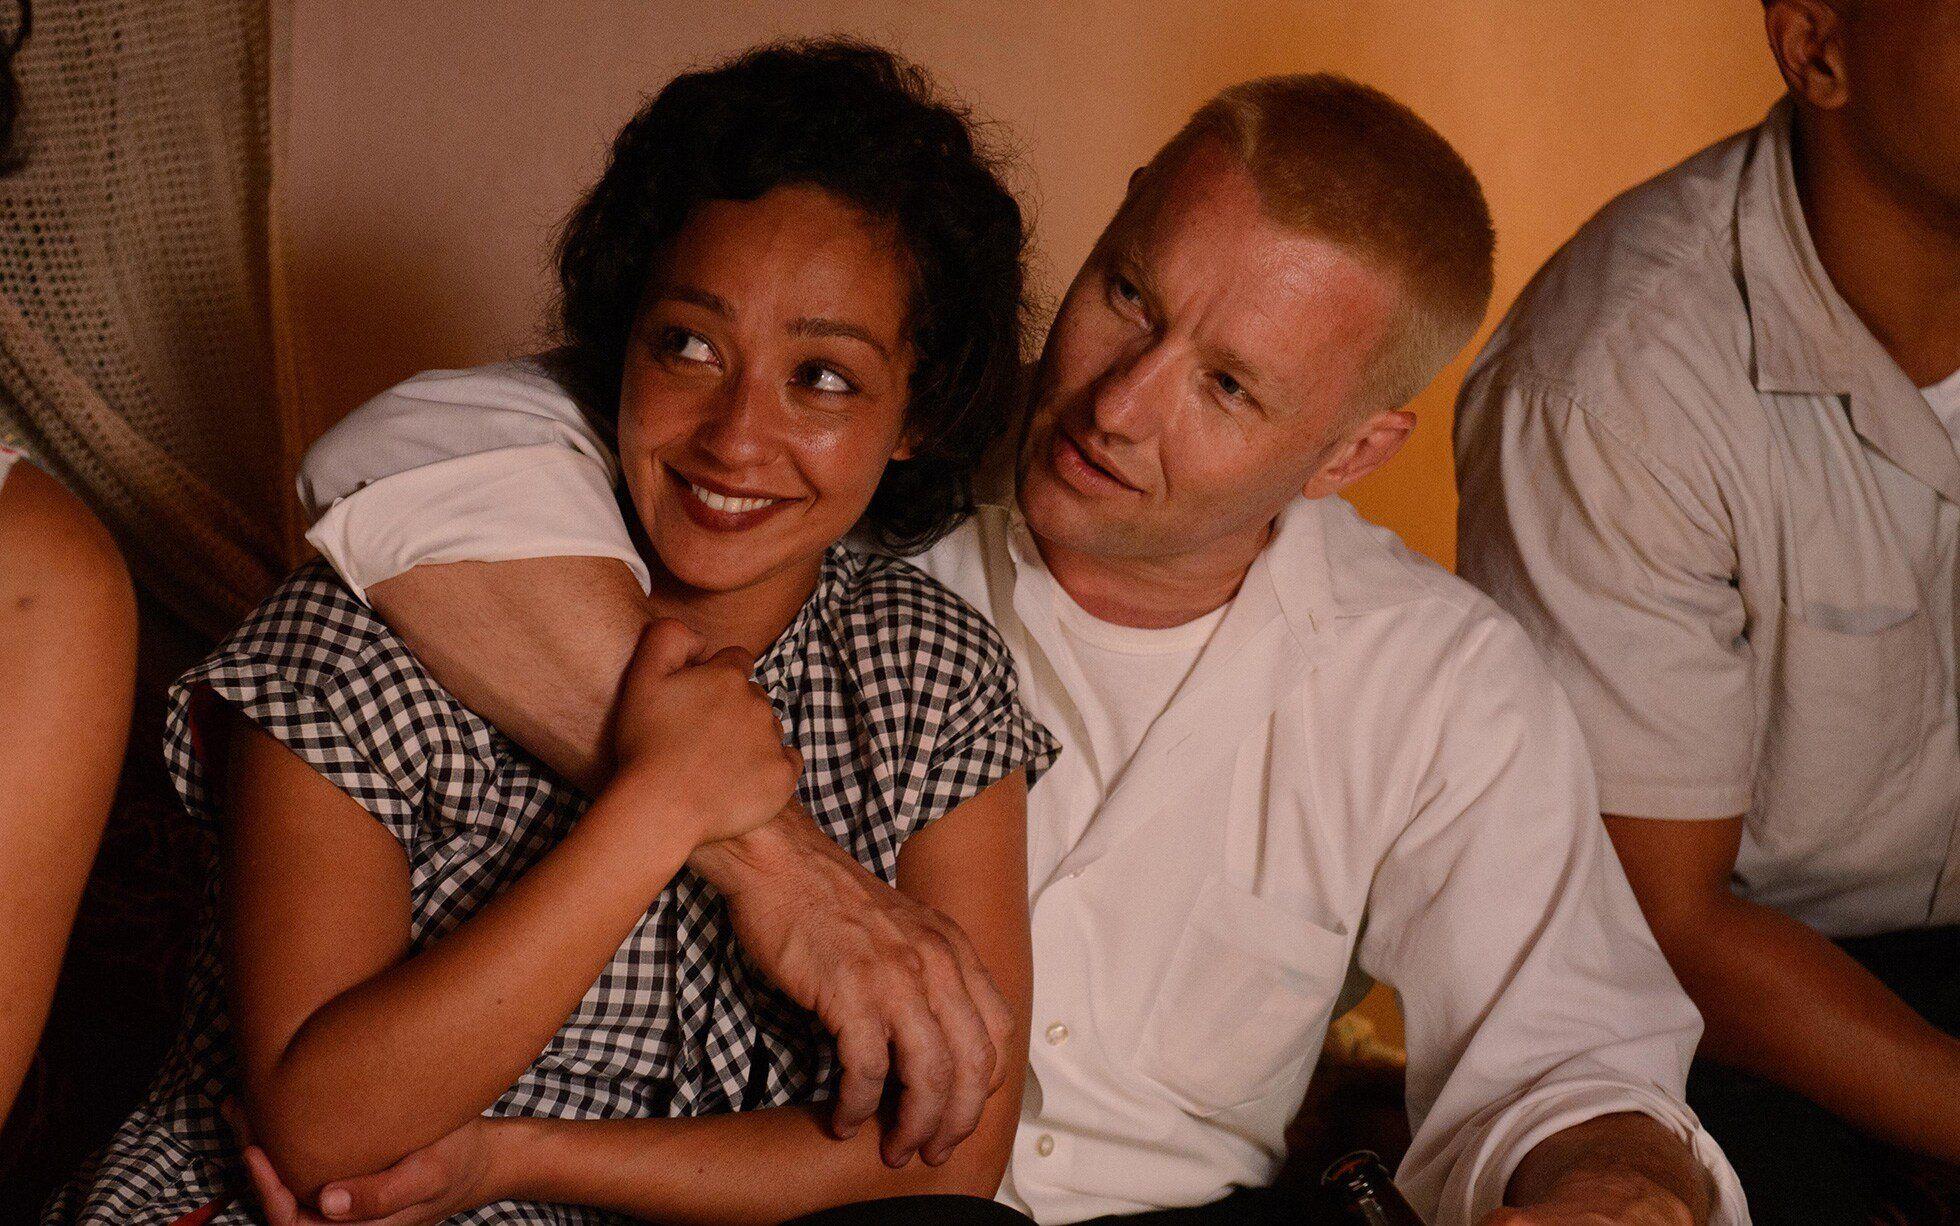 Tomahawk recomended Nikki benz hot orgasm sex